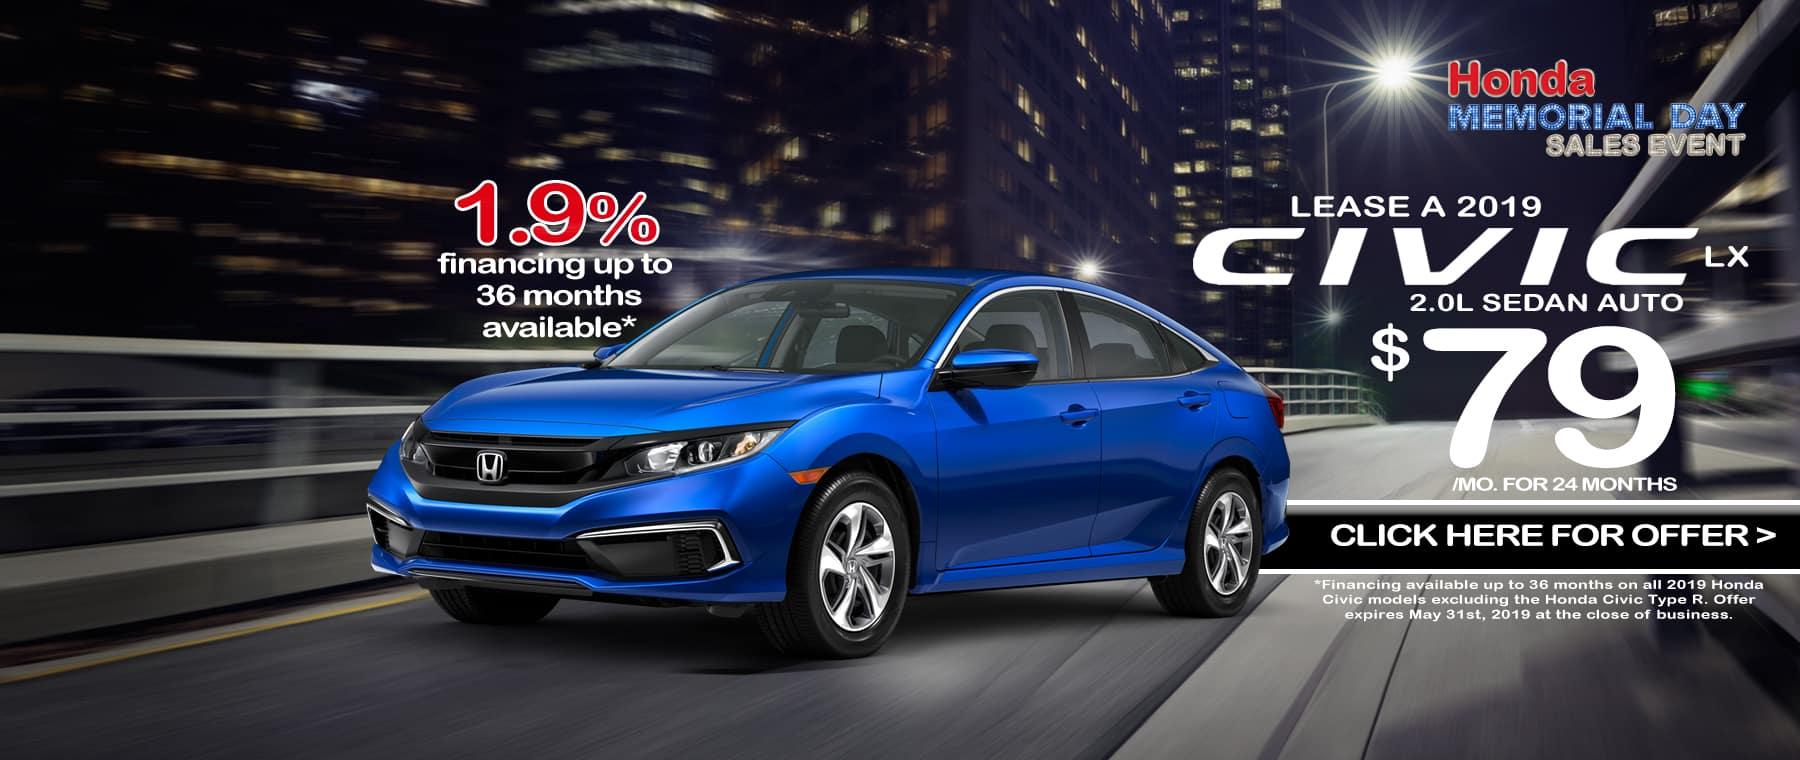 New Pre Owned Honda Dealership Hillside Honda In Jamaica Ny